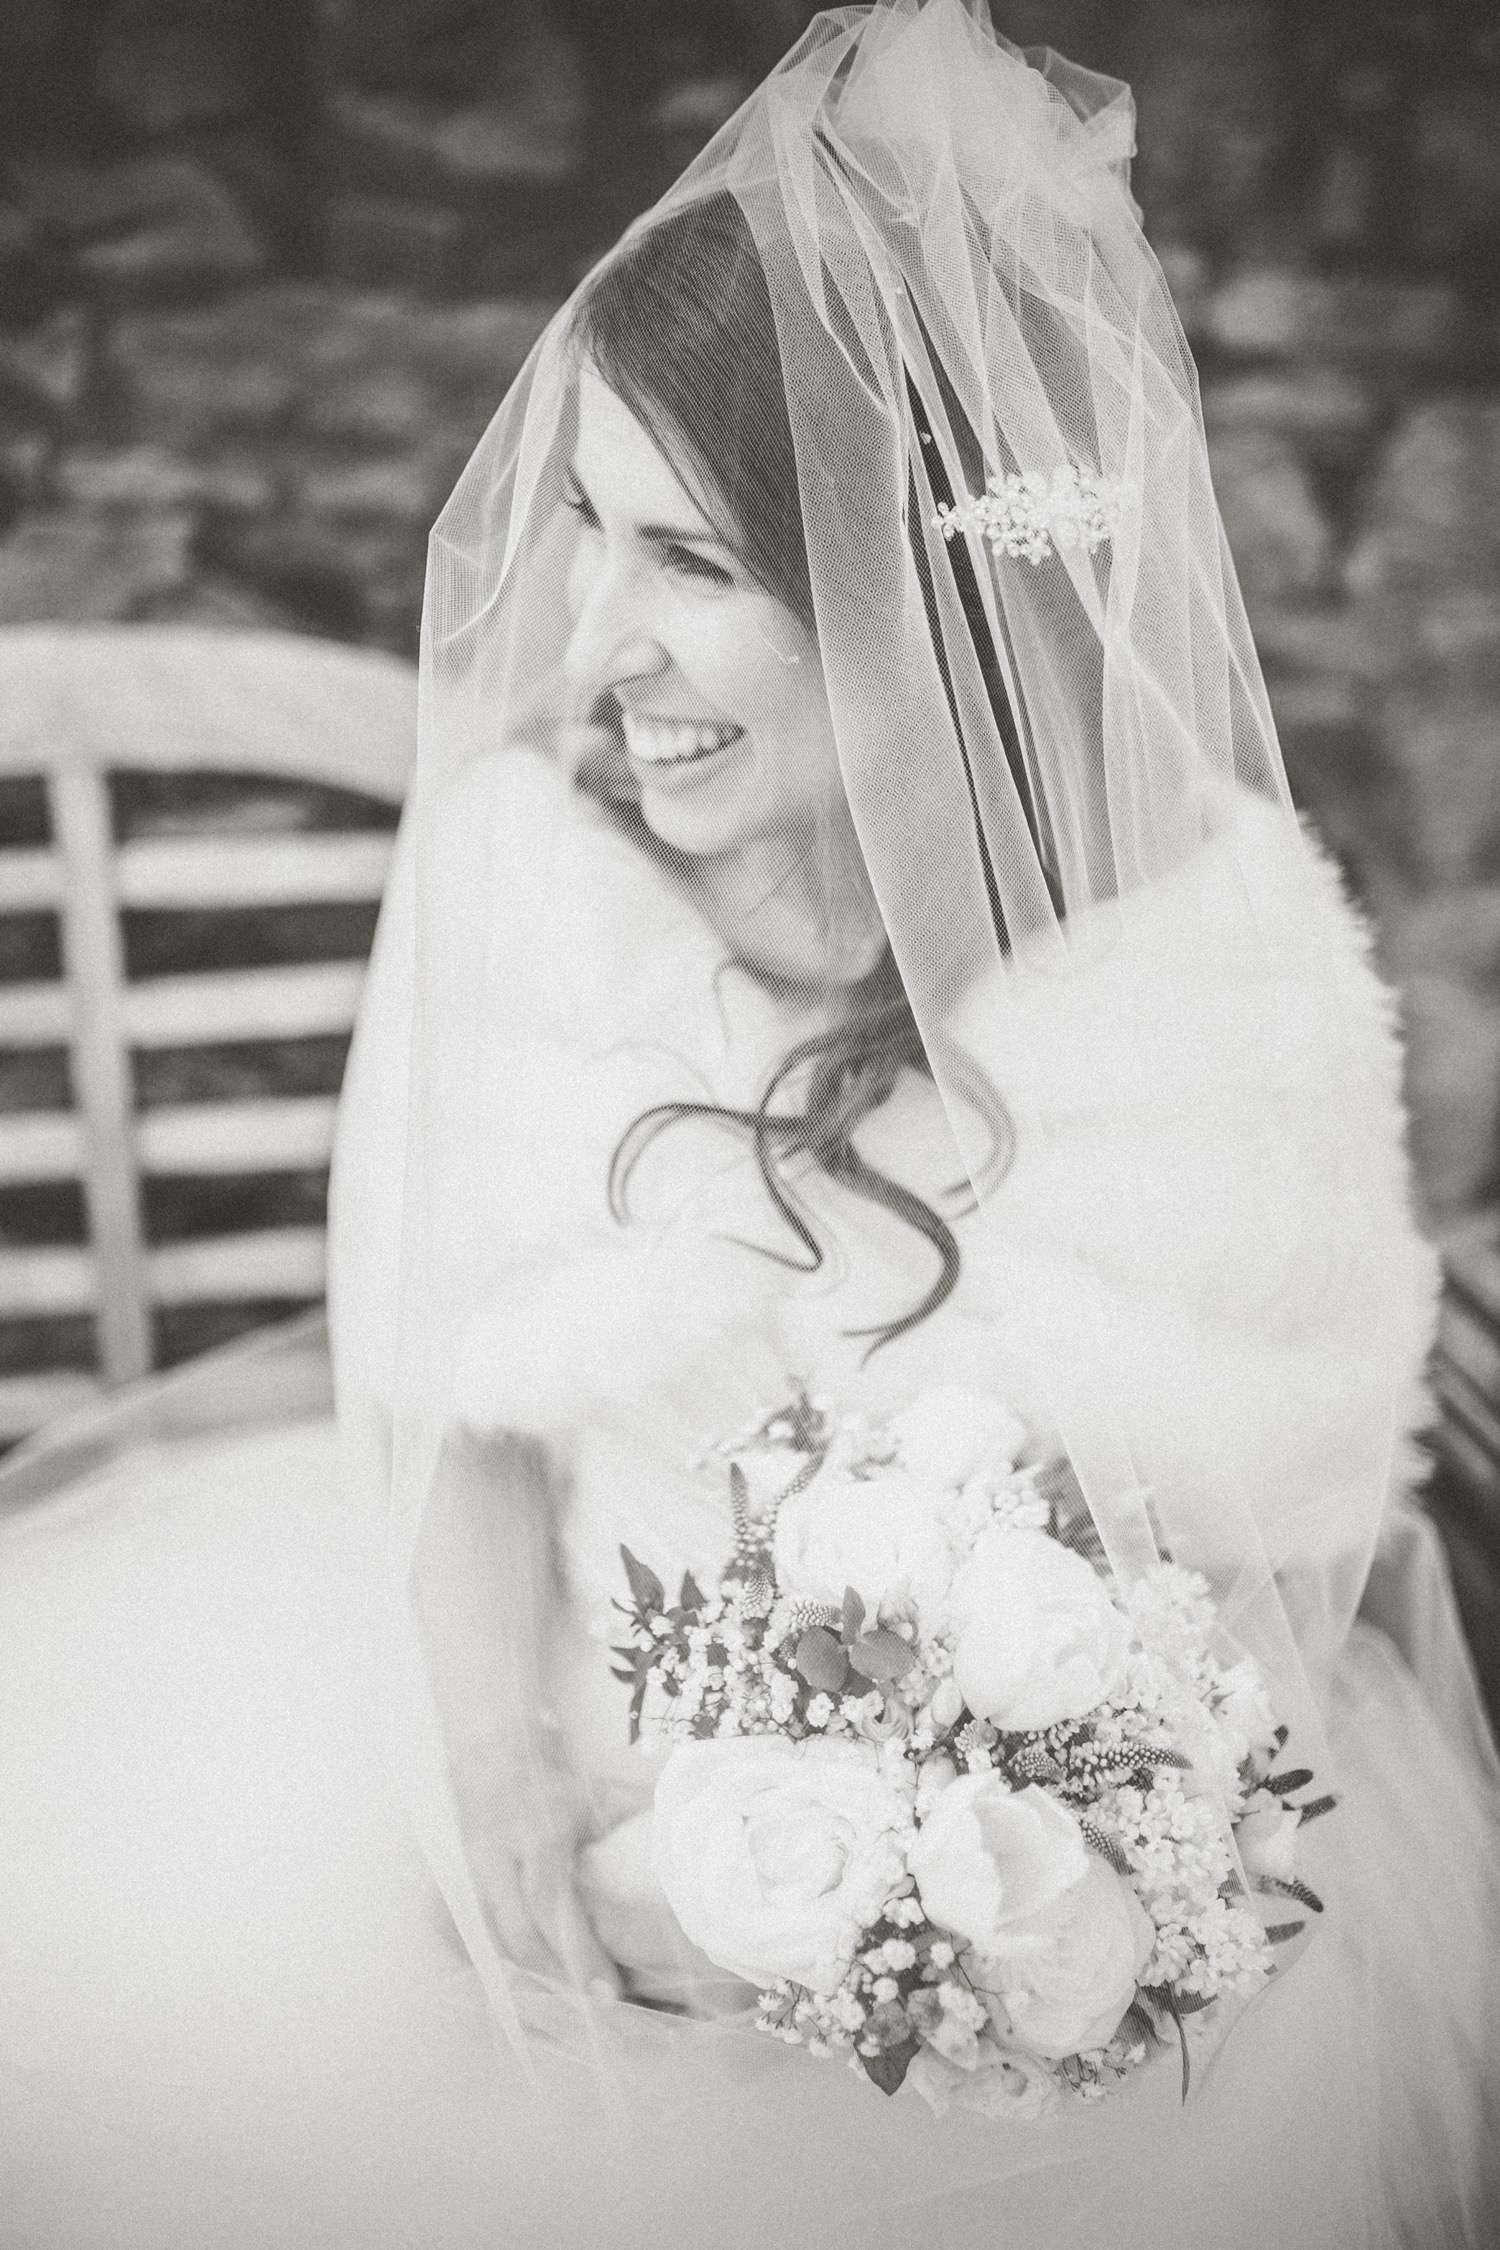 The Natural Bride // Emma Moir  // 28 Mar // Doxford Barns